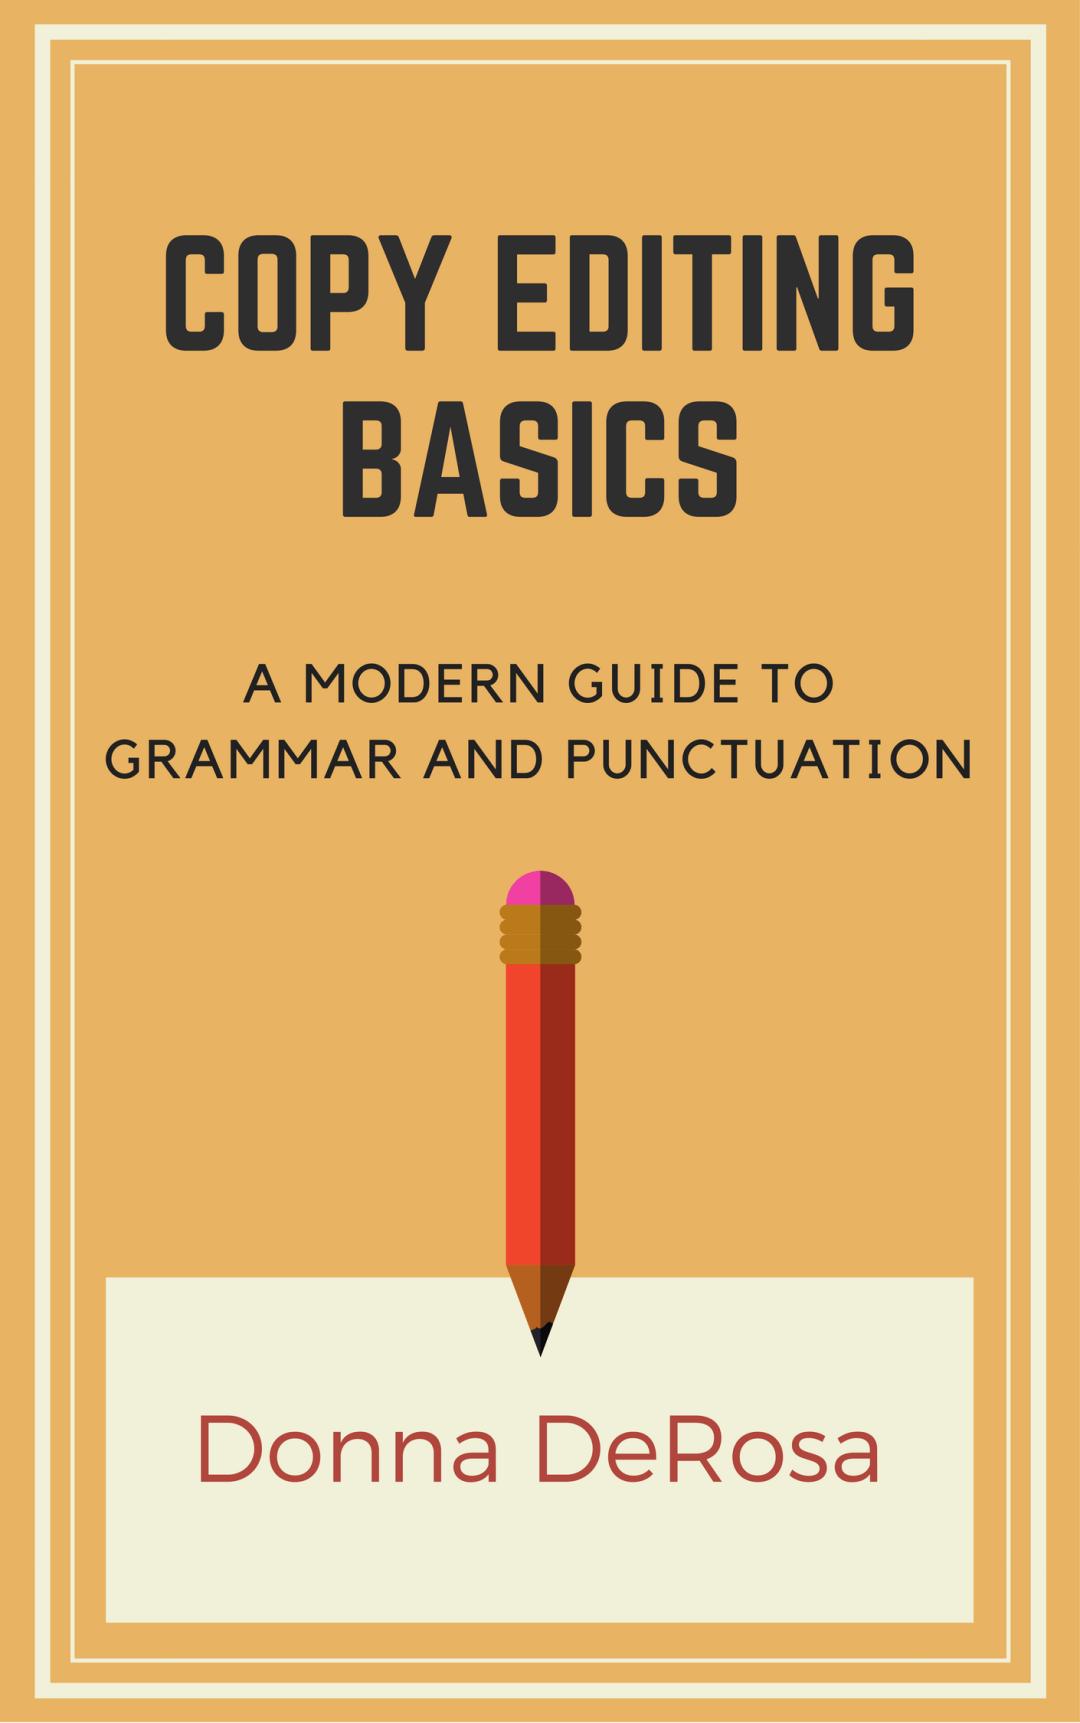 Copy Editing Basics